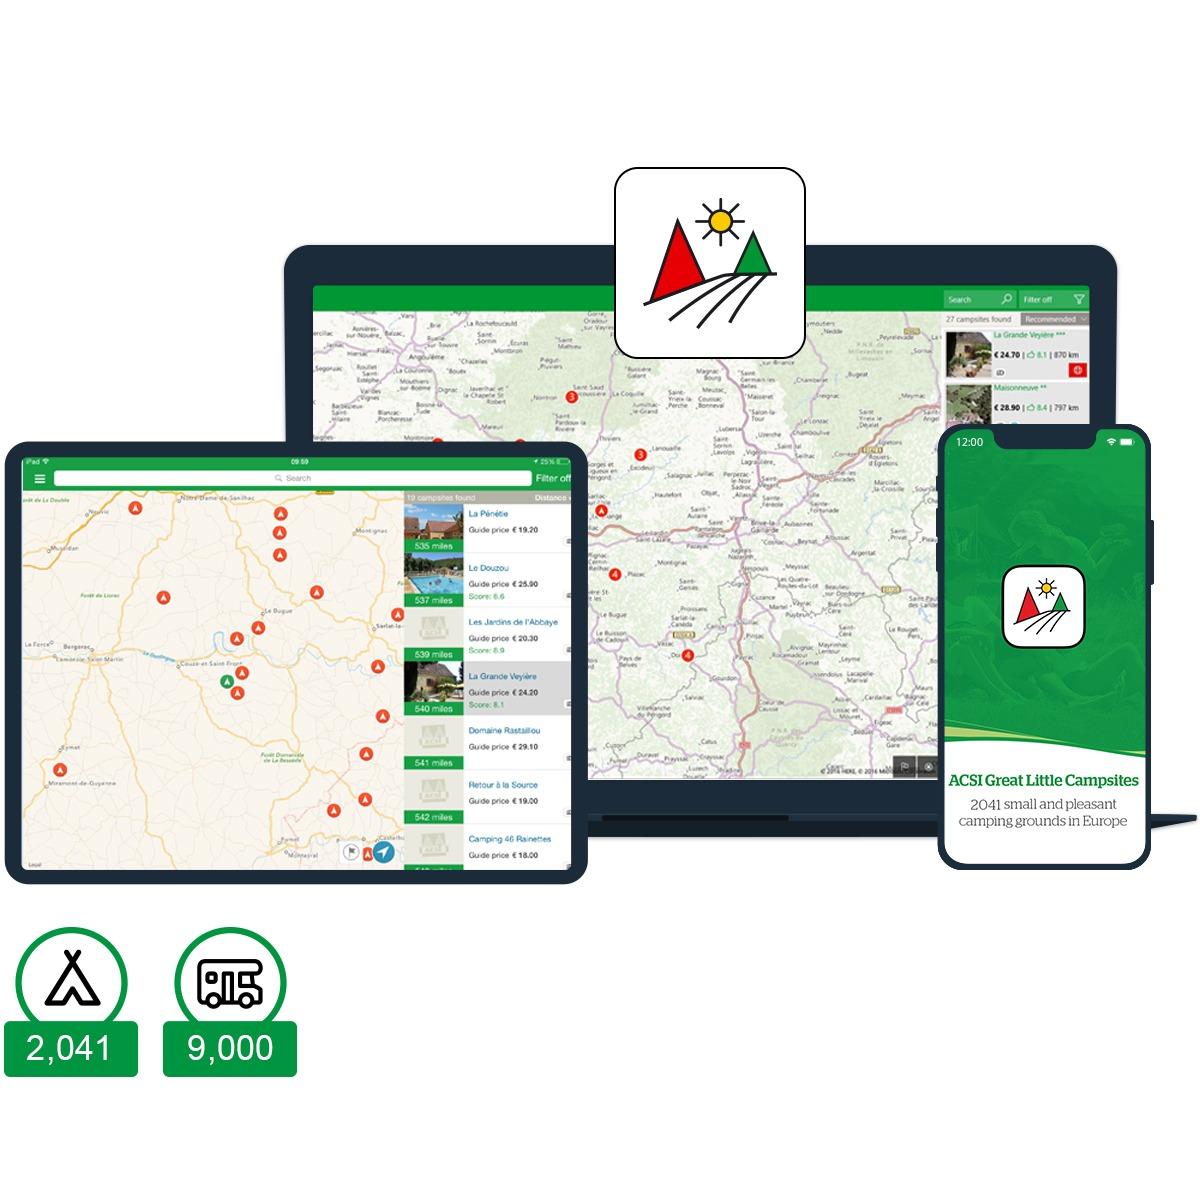 ACSI Great Little Campsites app